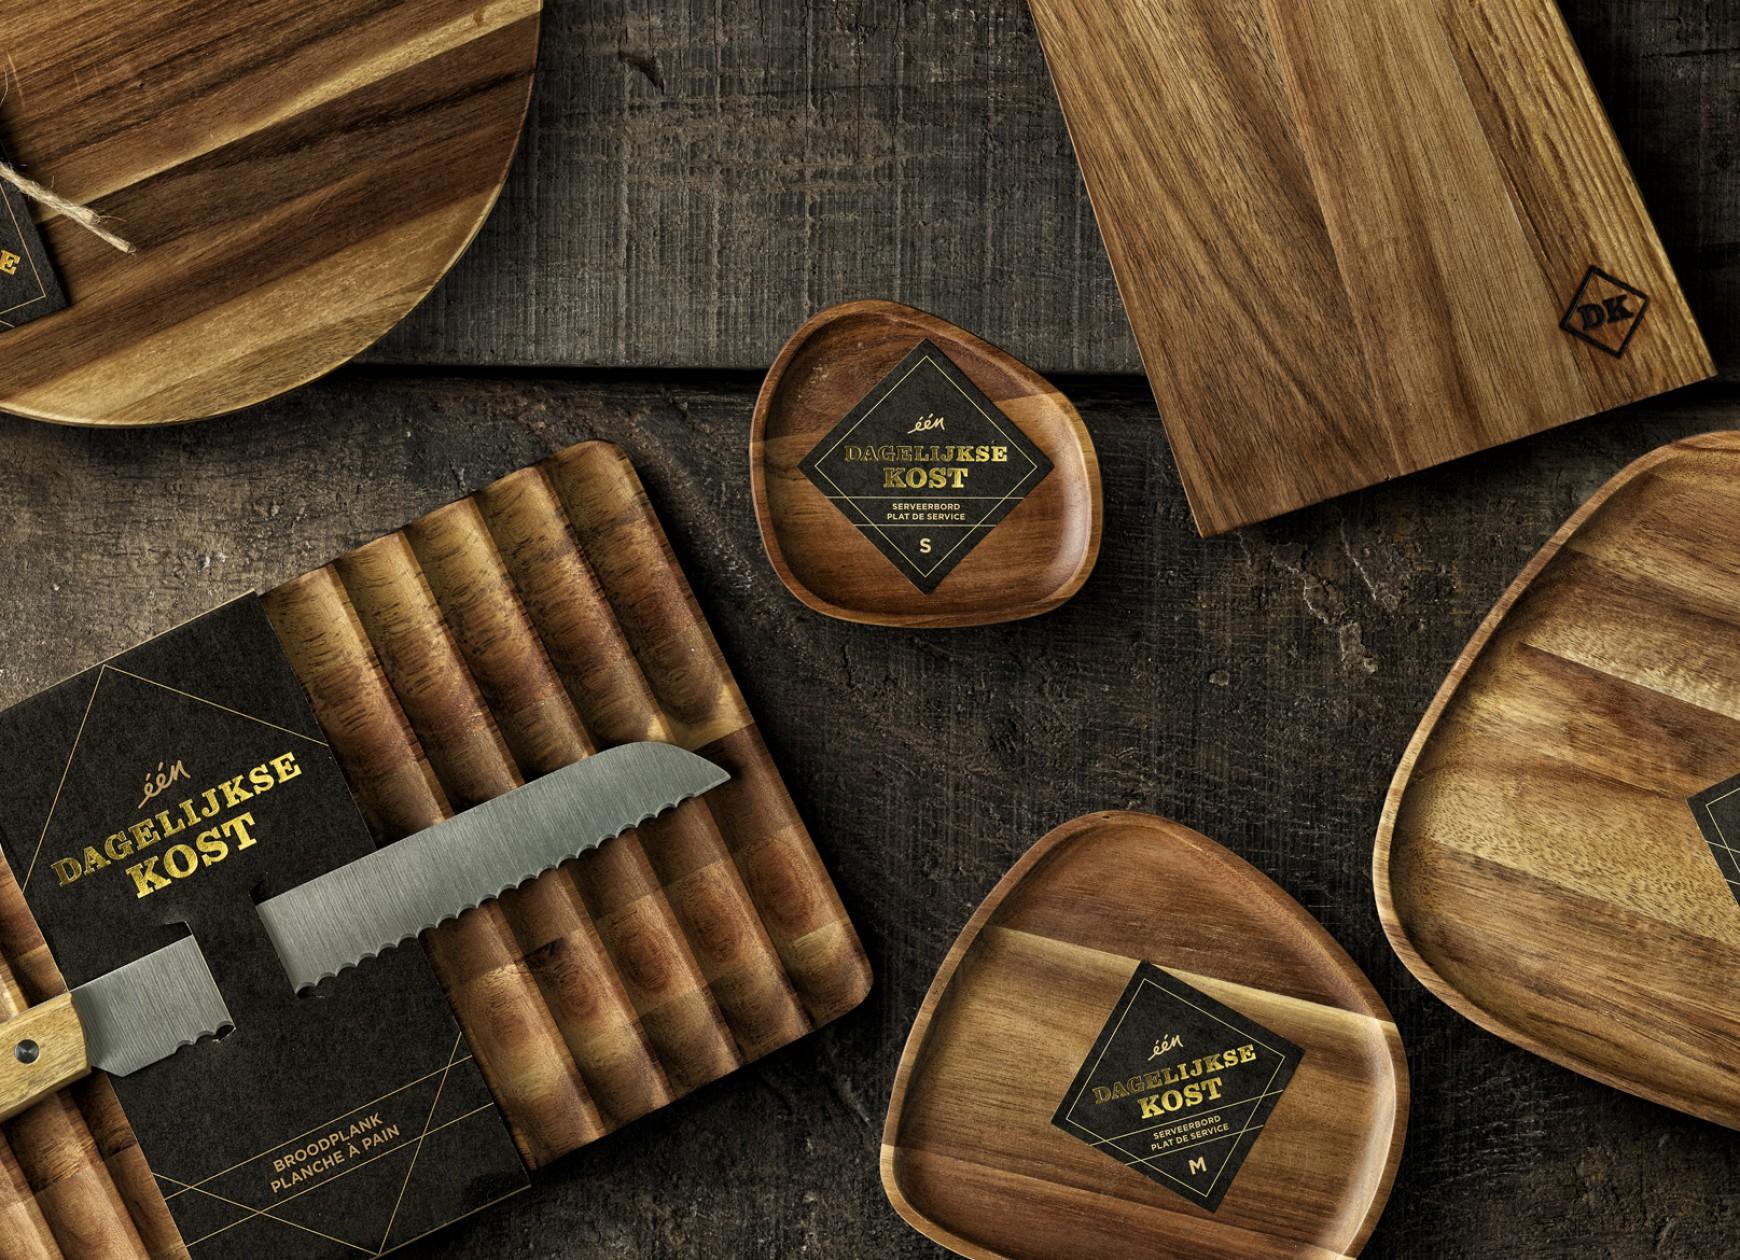 Quatre Mains package design - Dagelijkse Kost Planken, Quatre Mains, Packaging, Branding